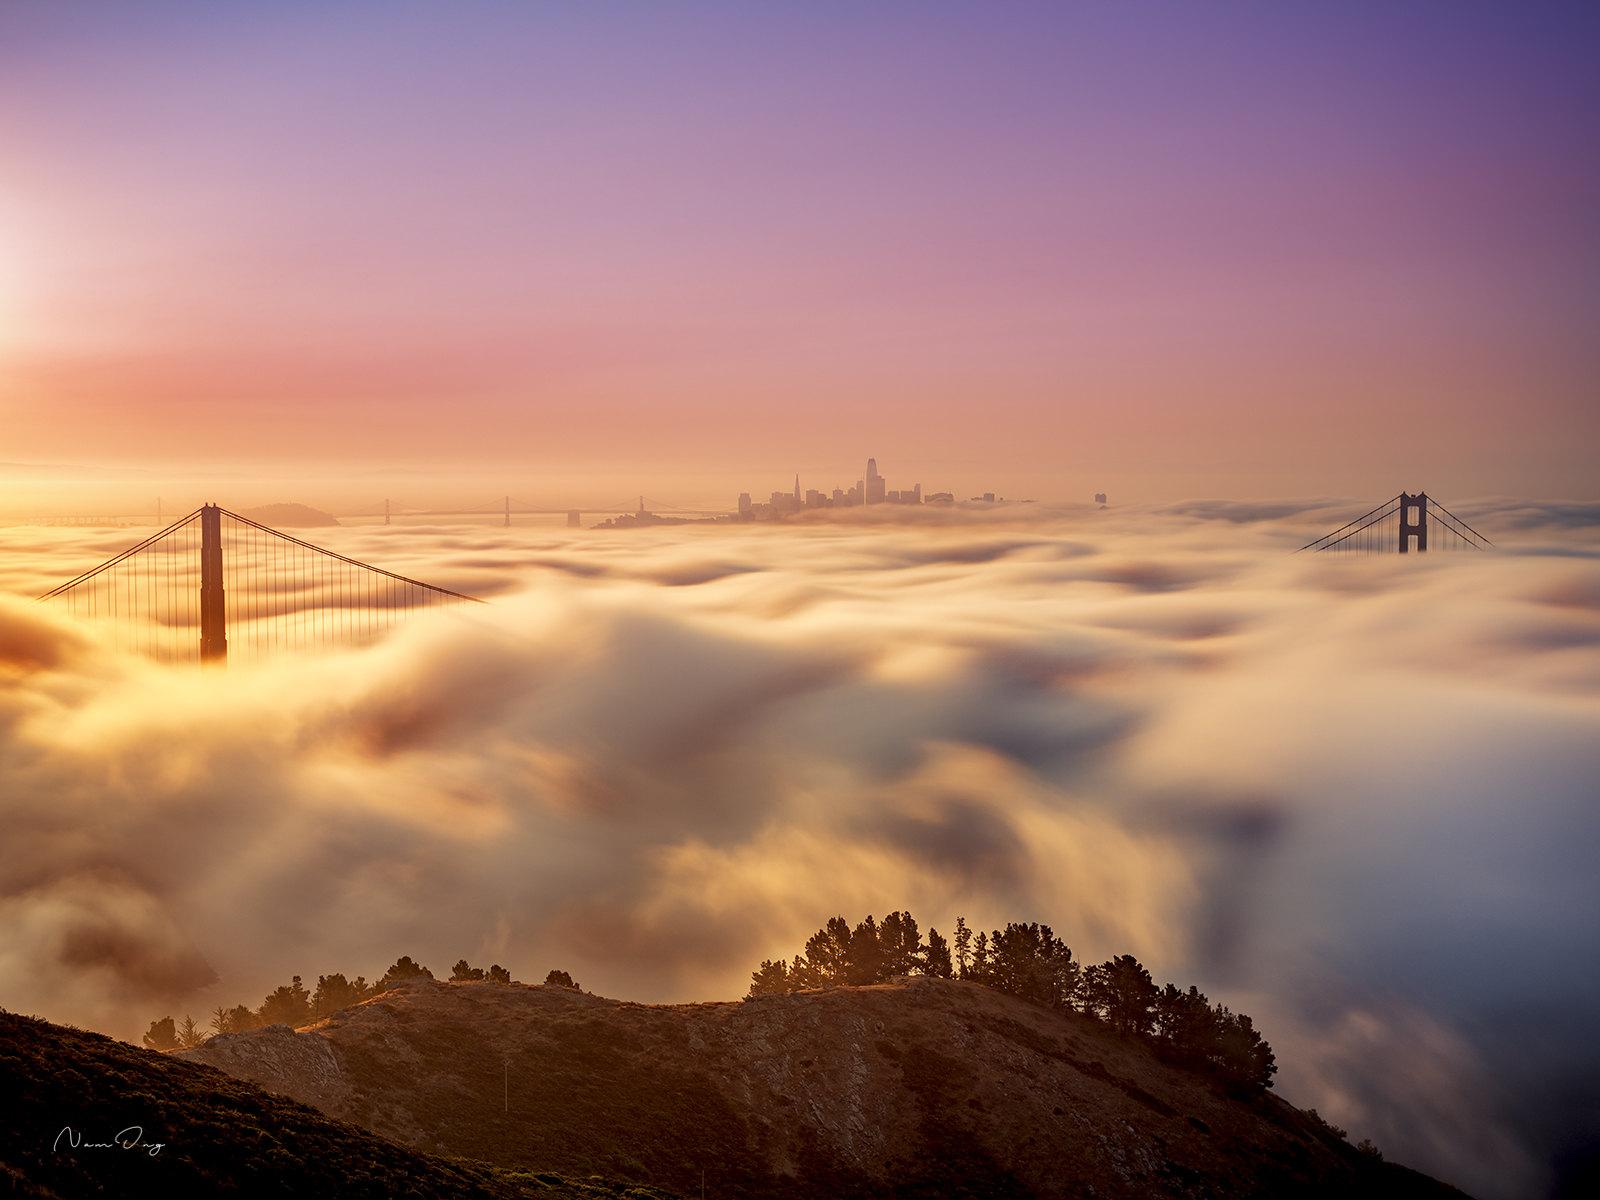 Golden Gate Bridge [+1 - 12-9-2018] 36836957670_9ee8a3bf46_h